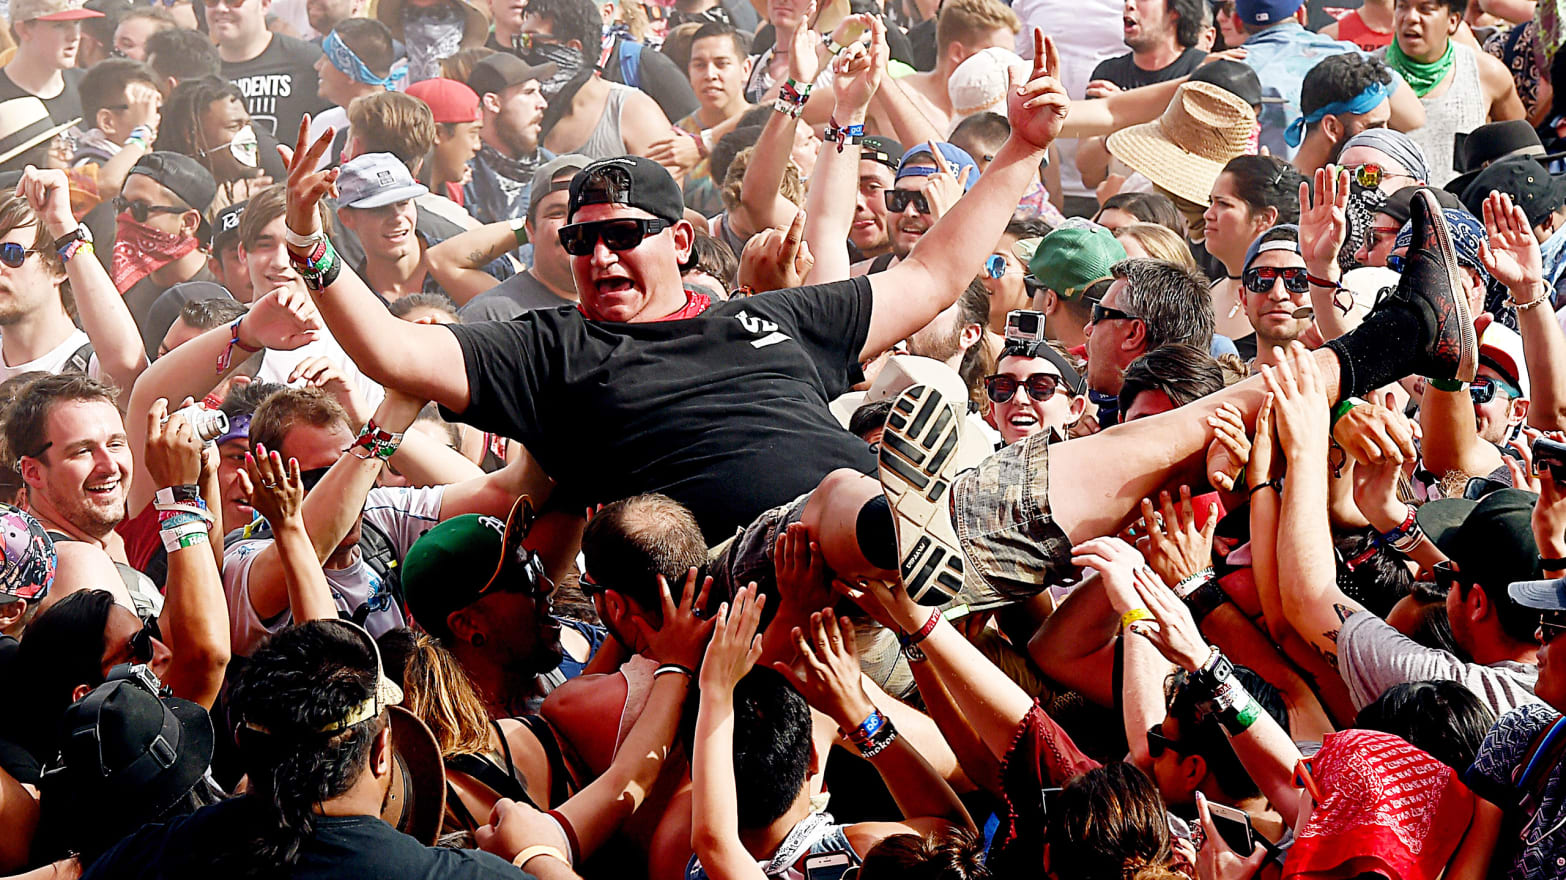 Coachella 2017 Is Already a Disaster